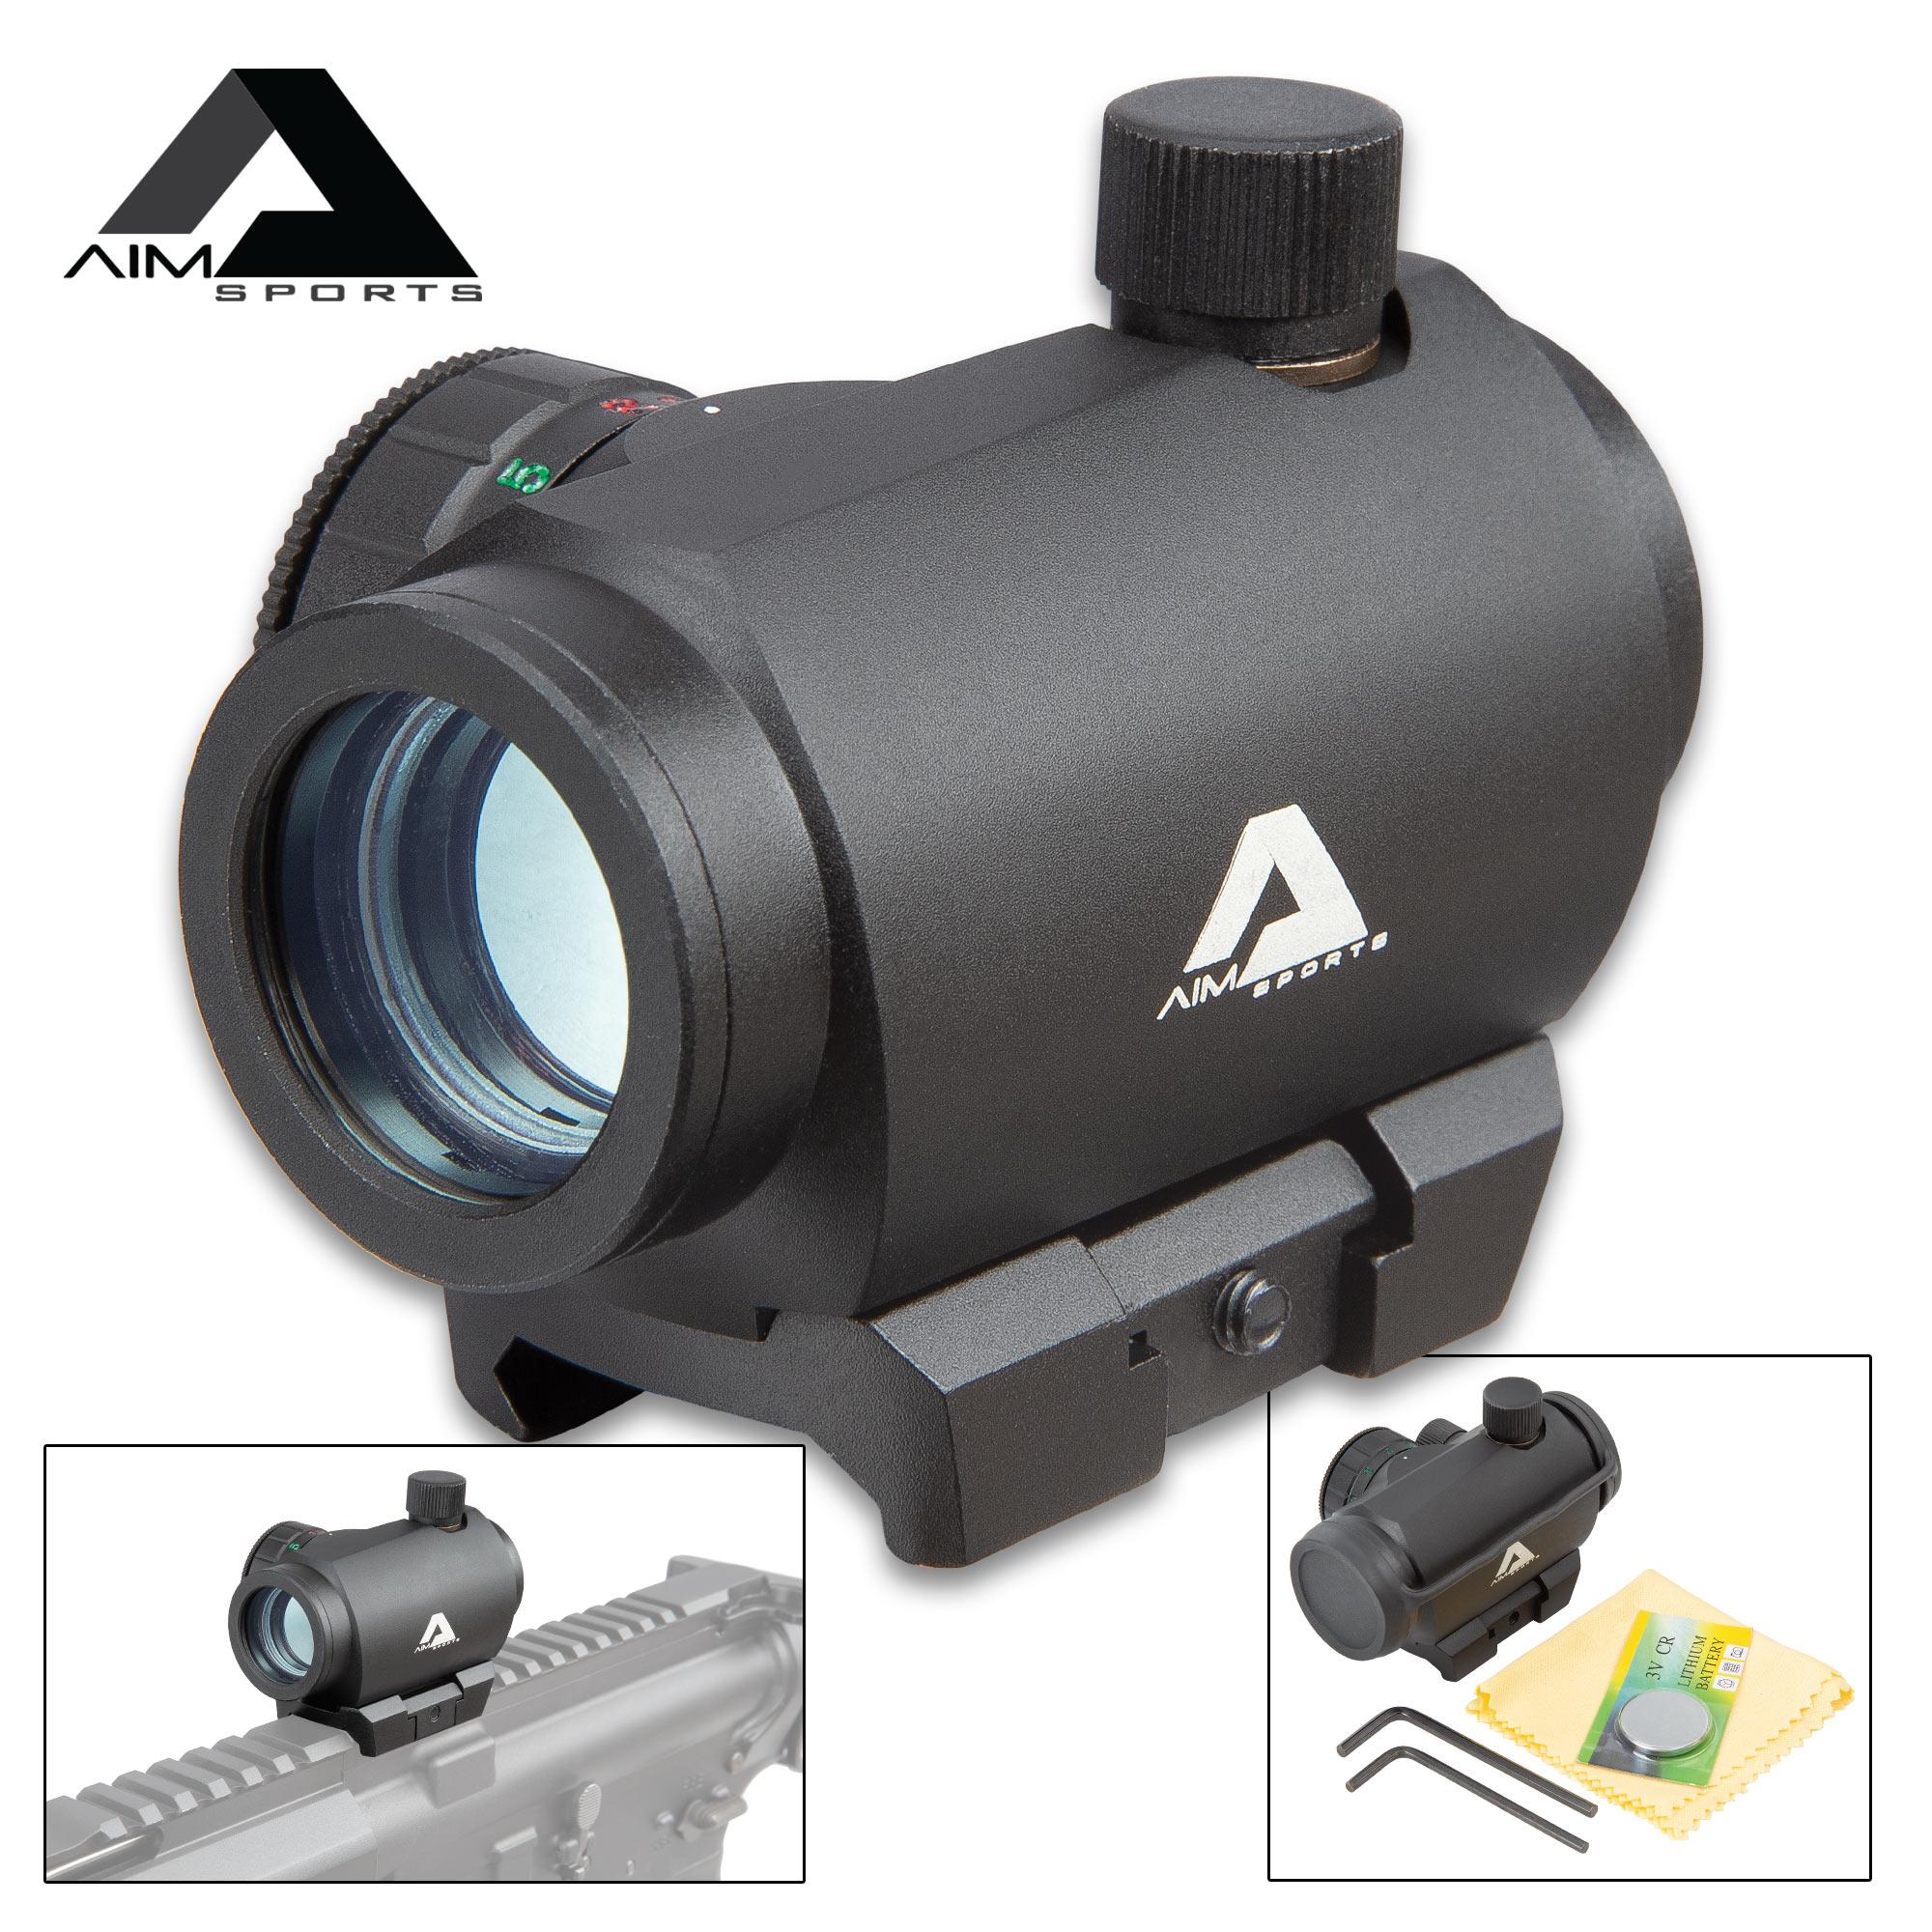 AIMS 1x20 MM Micro Dot Sight